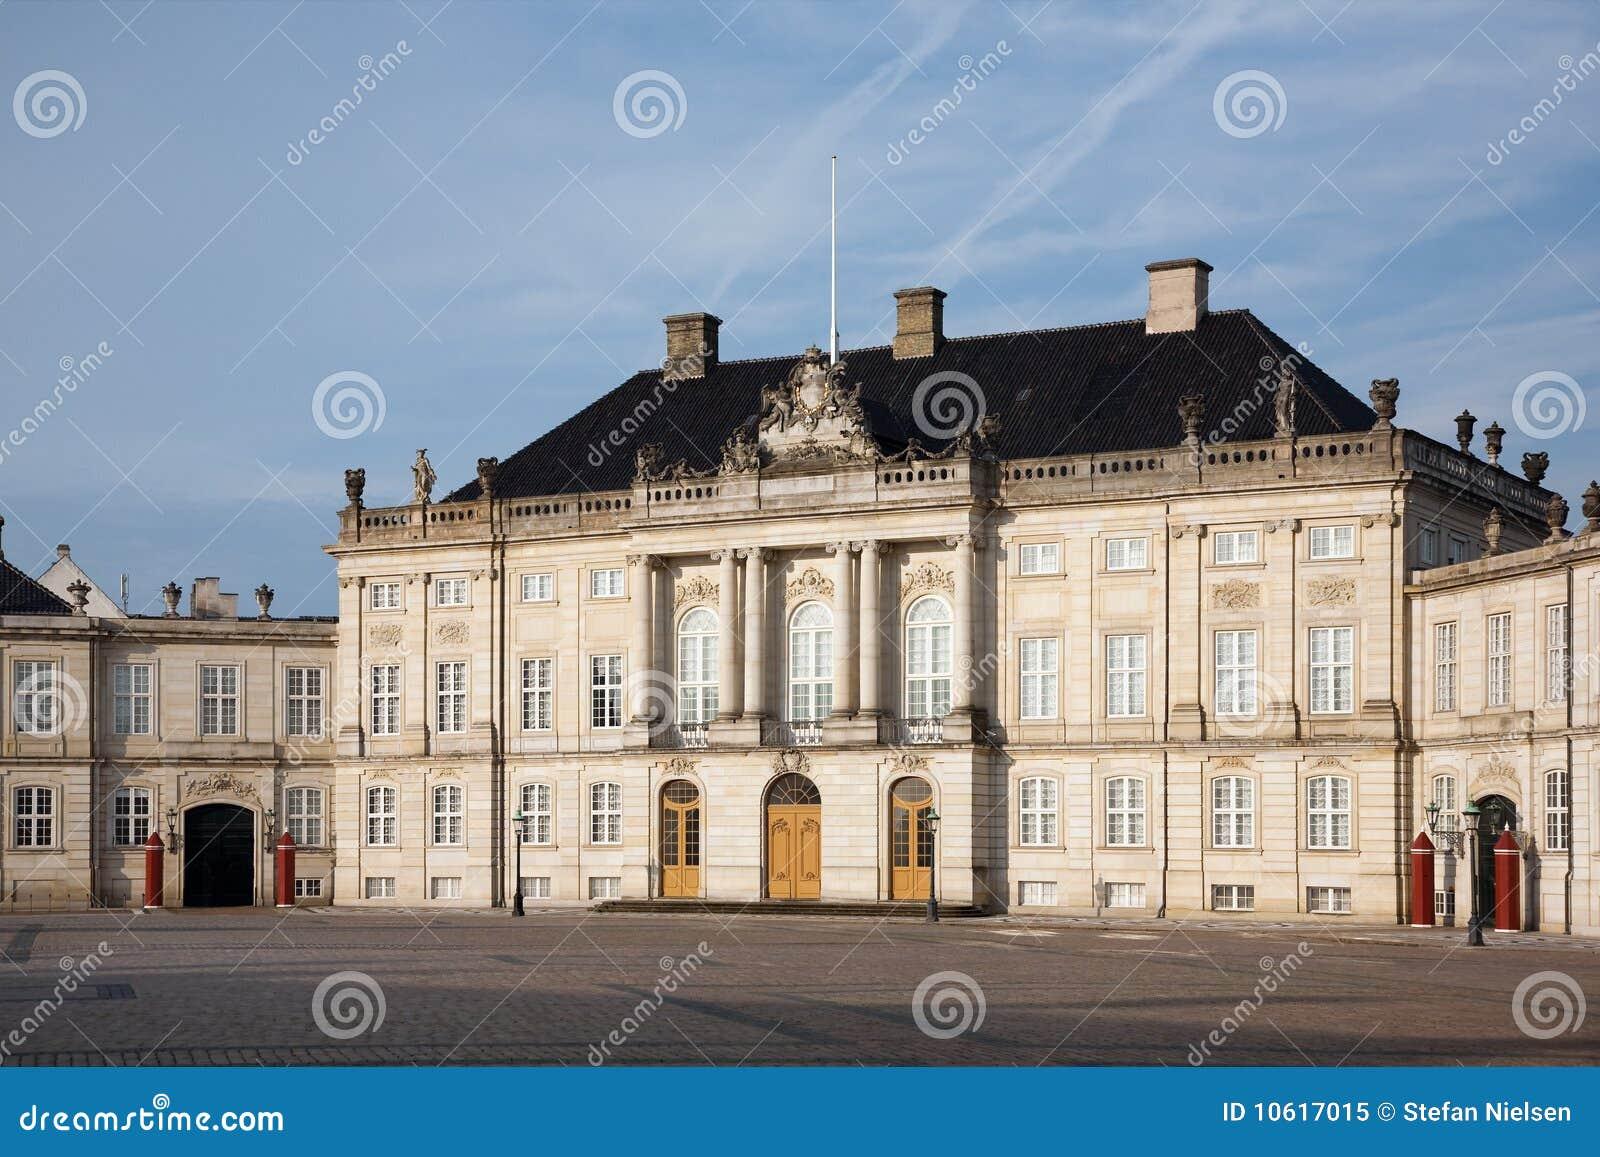 Castillo de Amalienborg